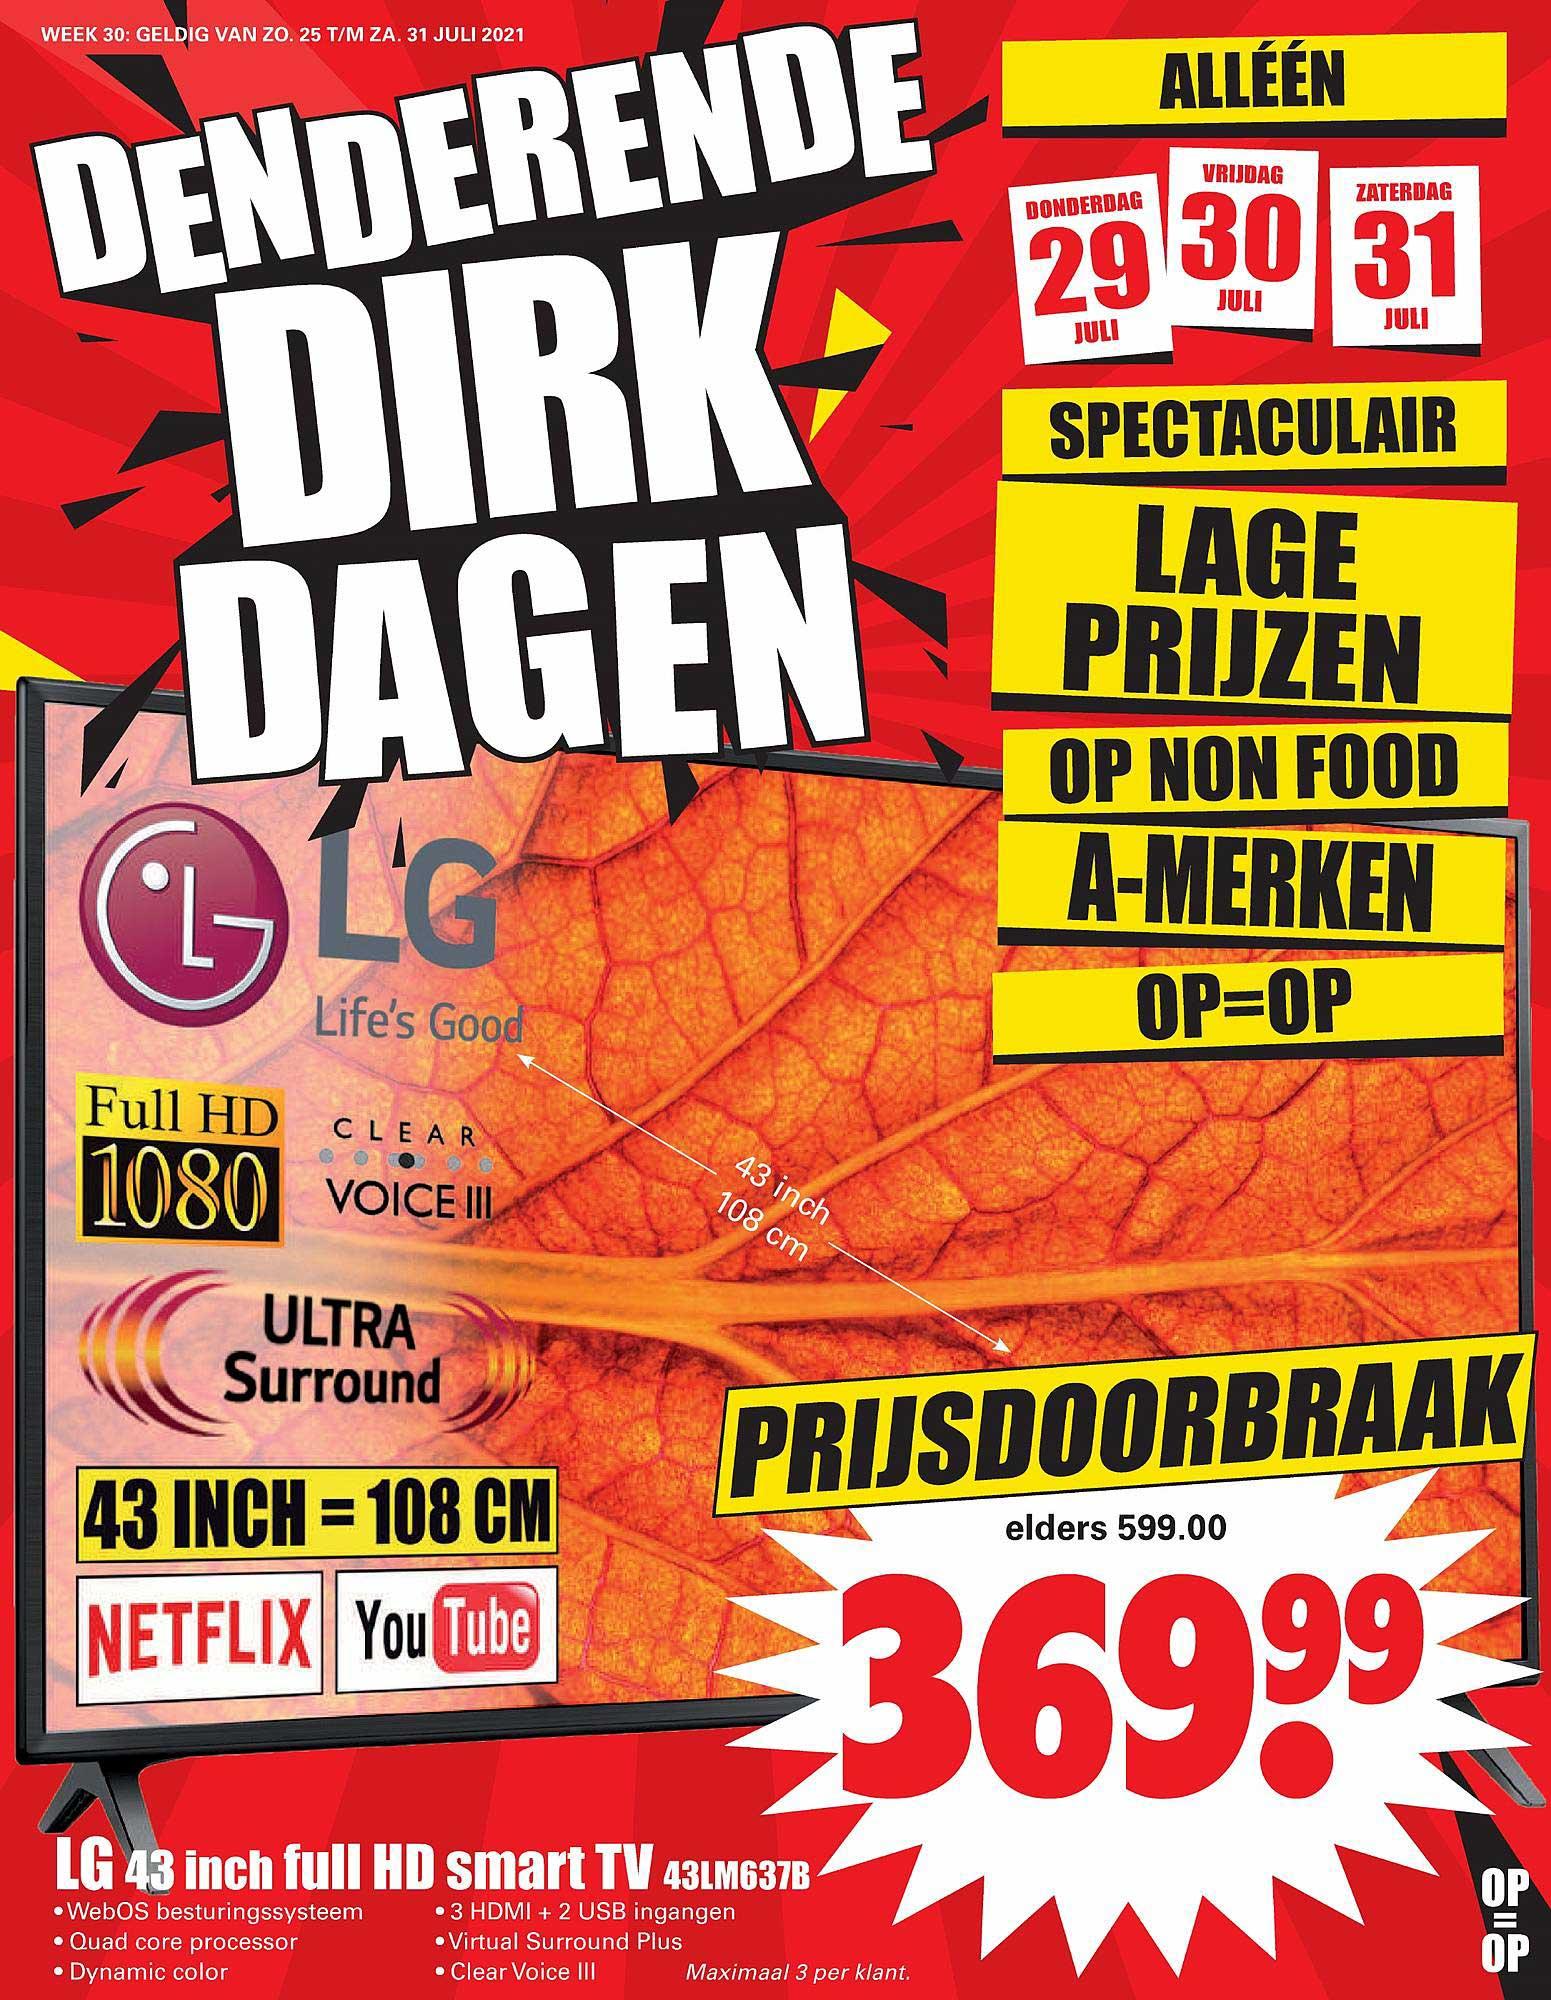 Dirk LG 43 Inch Full HD Smart TV 43LM637B